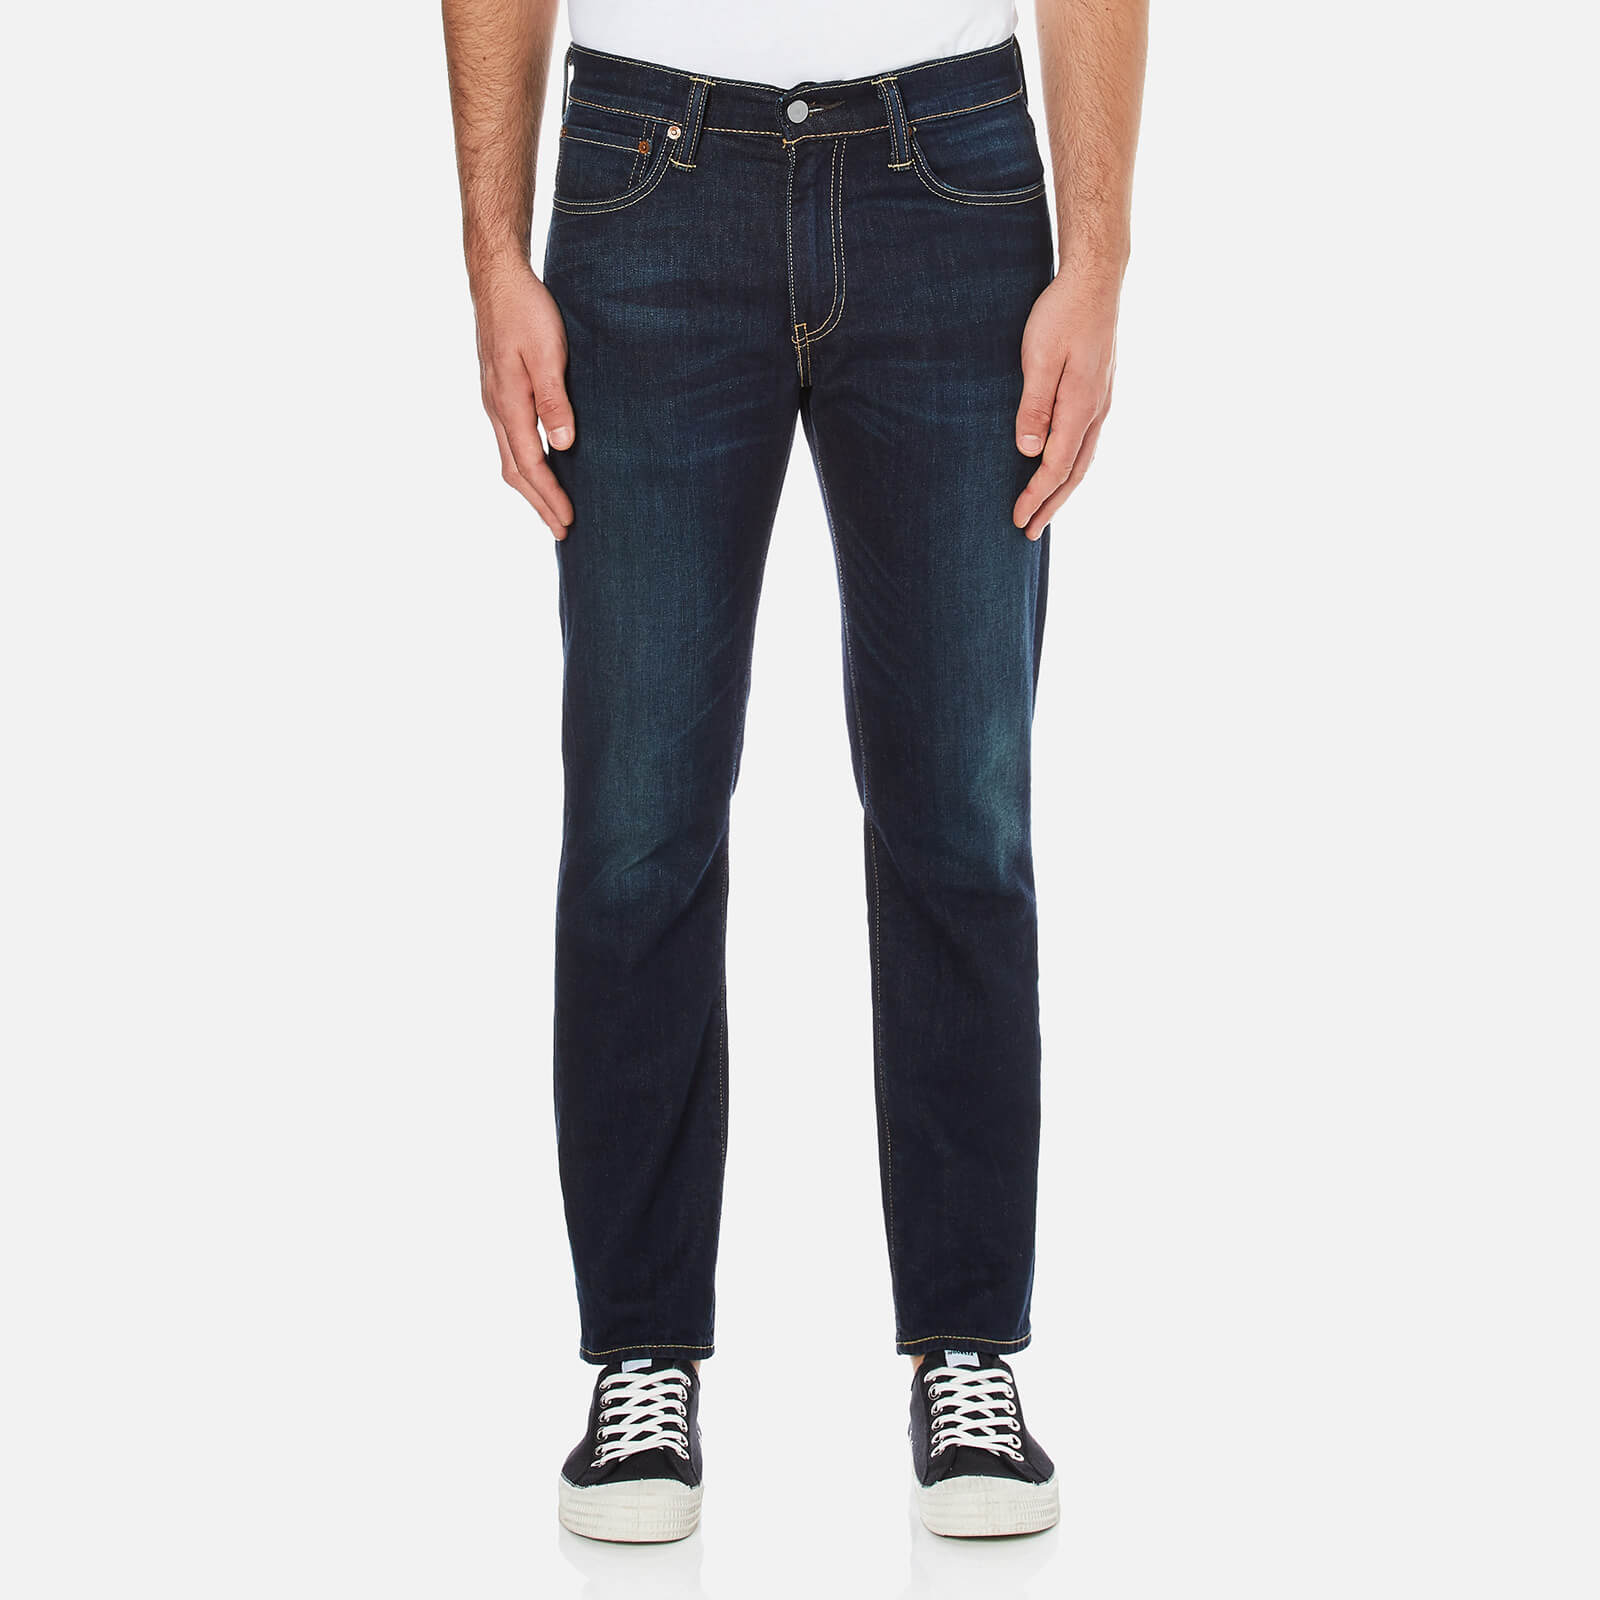 Levi/'s Men/'s 511 Slim Fit Jeans Blue Biology